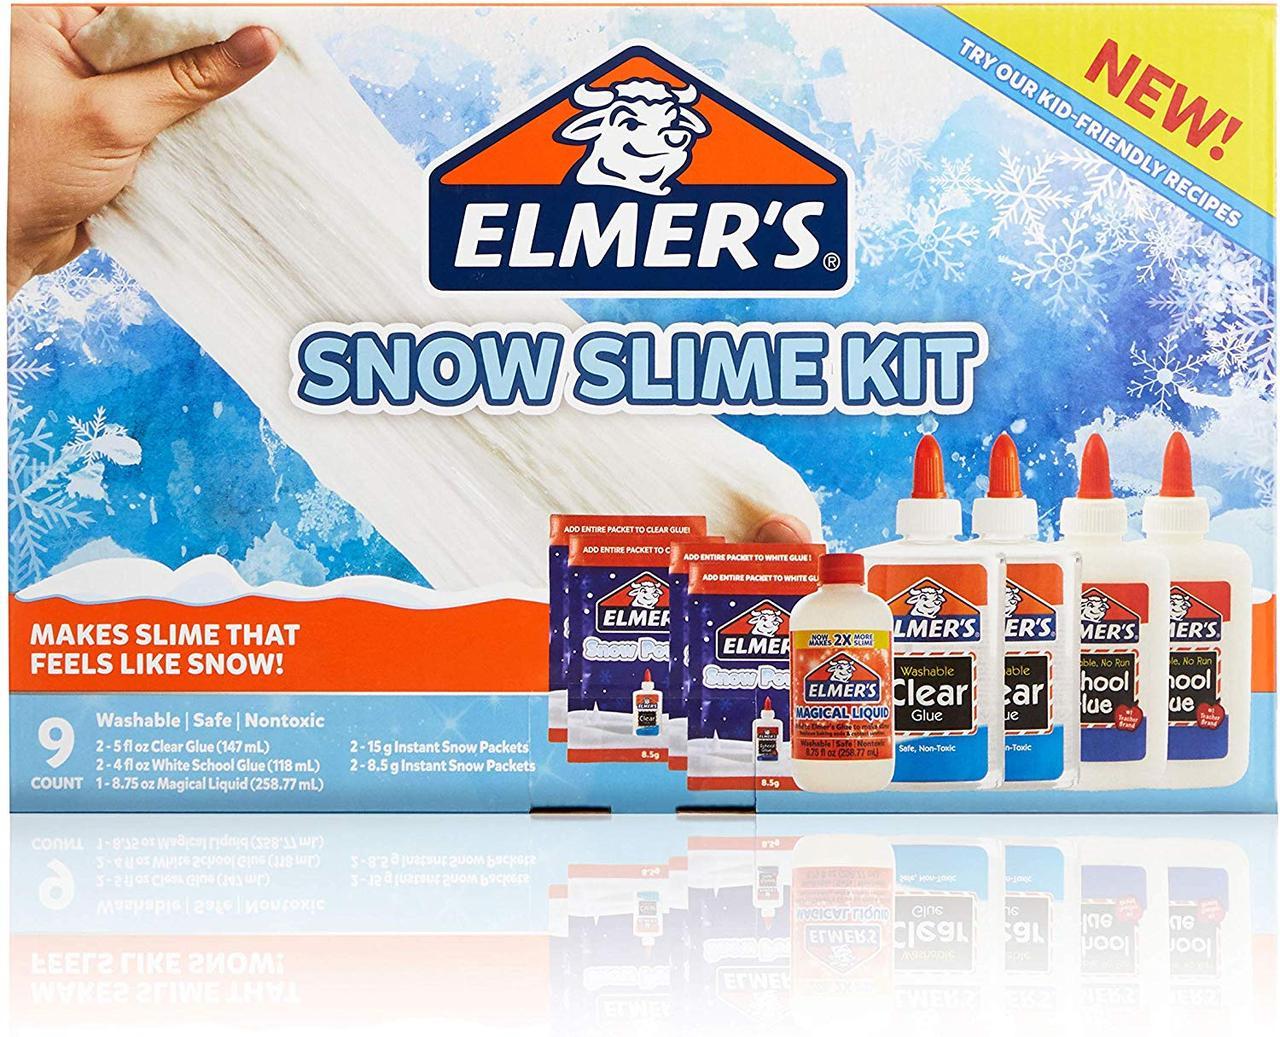 Набор Elmer's для Снежного слайма. Клей Elmer's+активатор+снег. SNOW Slime Kit. Оригинал из США